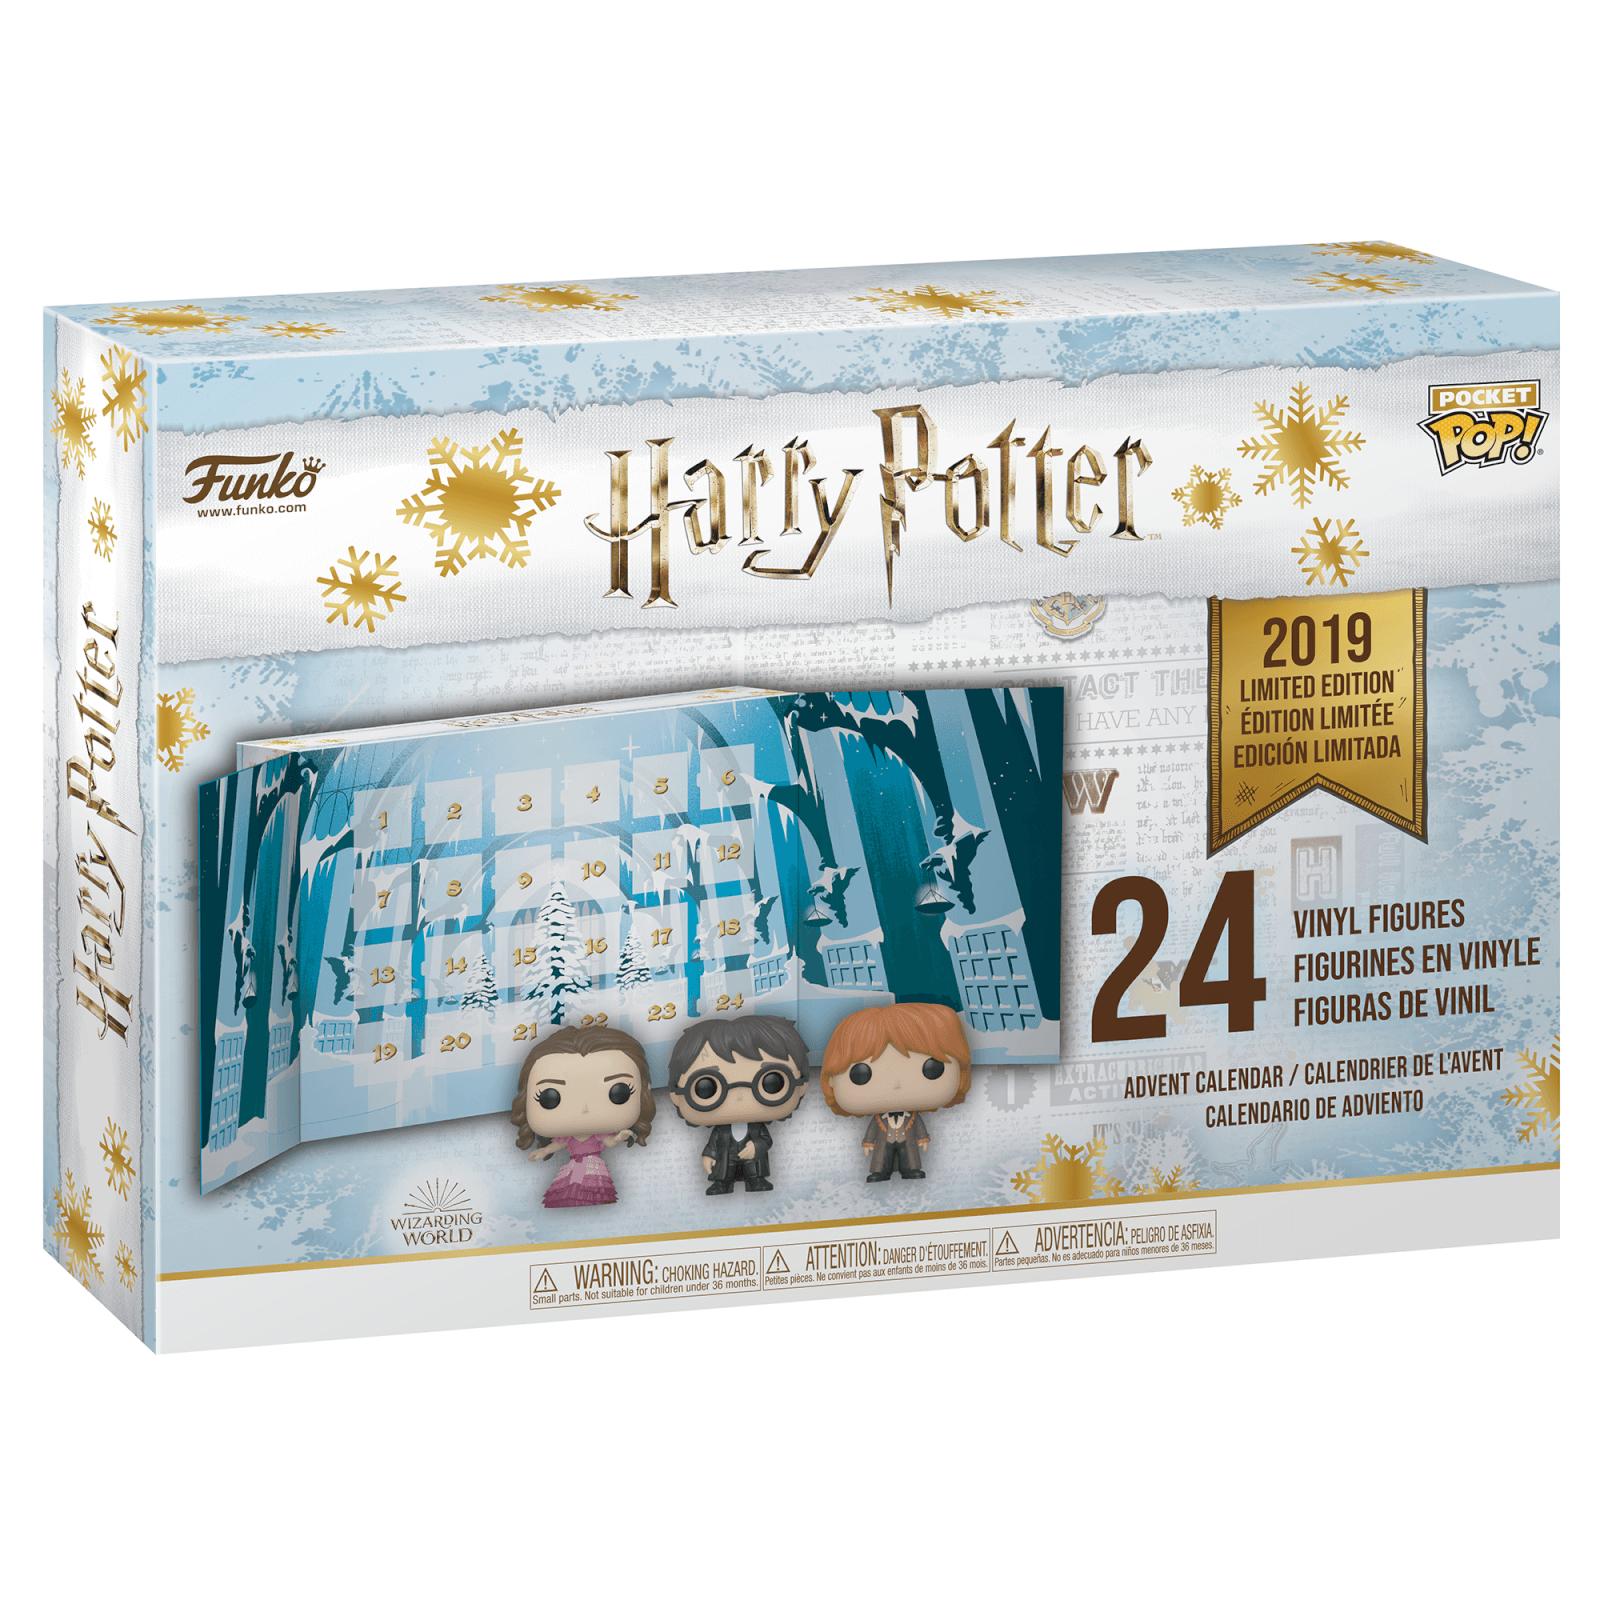 Calendrier de l'Avent Harry Potter Funko 2019